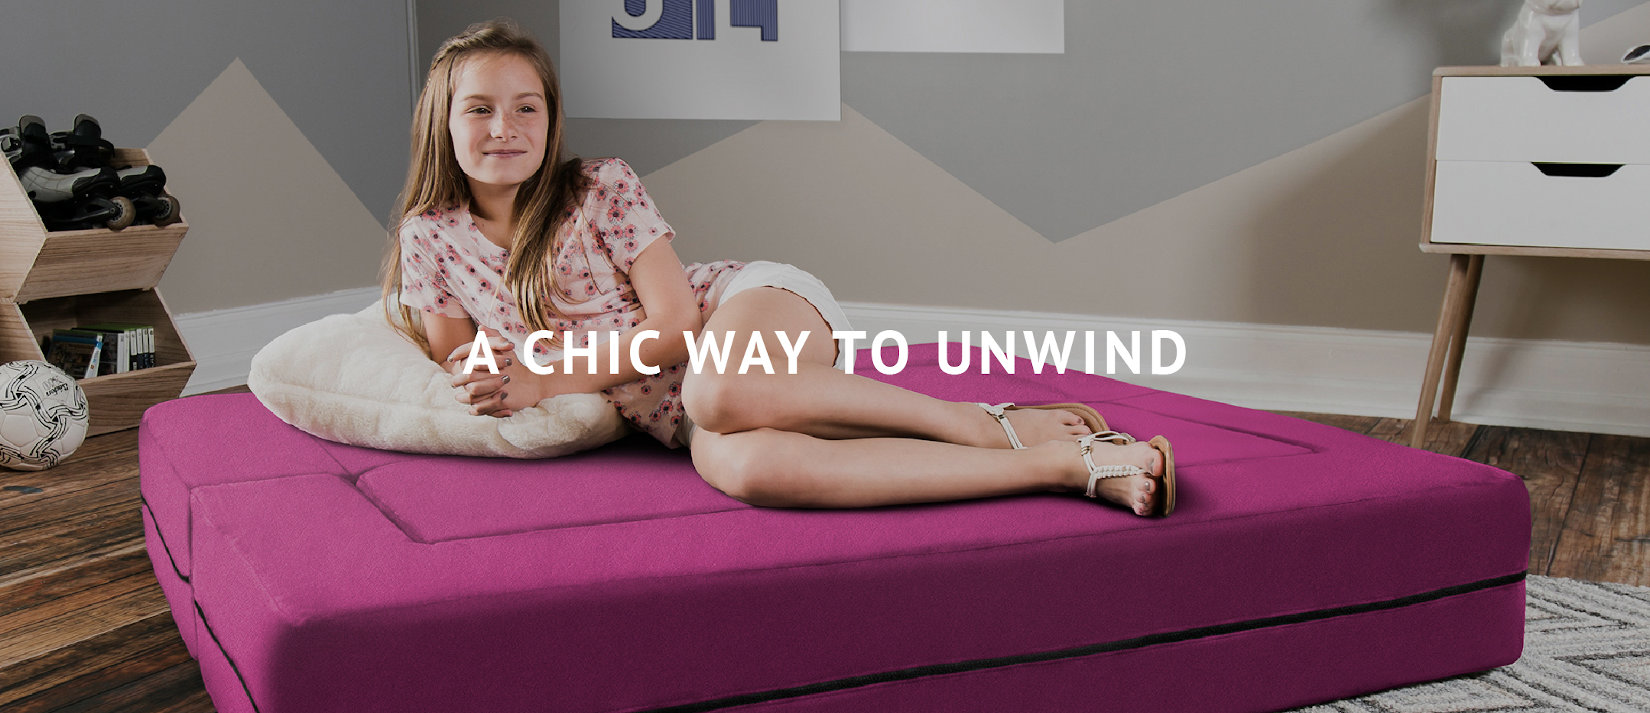 A Chic Way to Unwind | Girl relaxing on the Zipline Big Kids Convertible Sofa